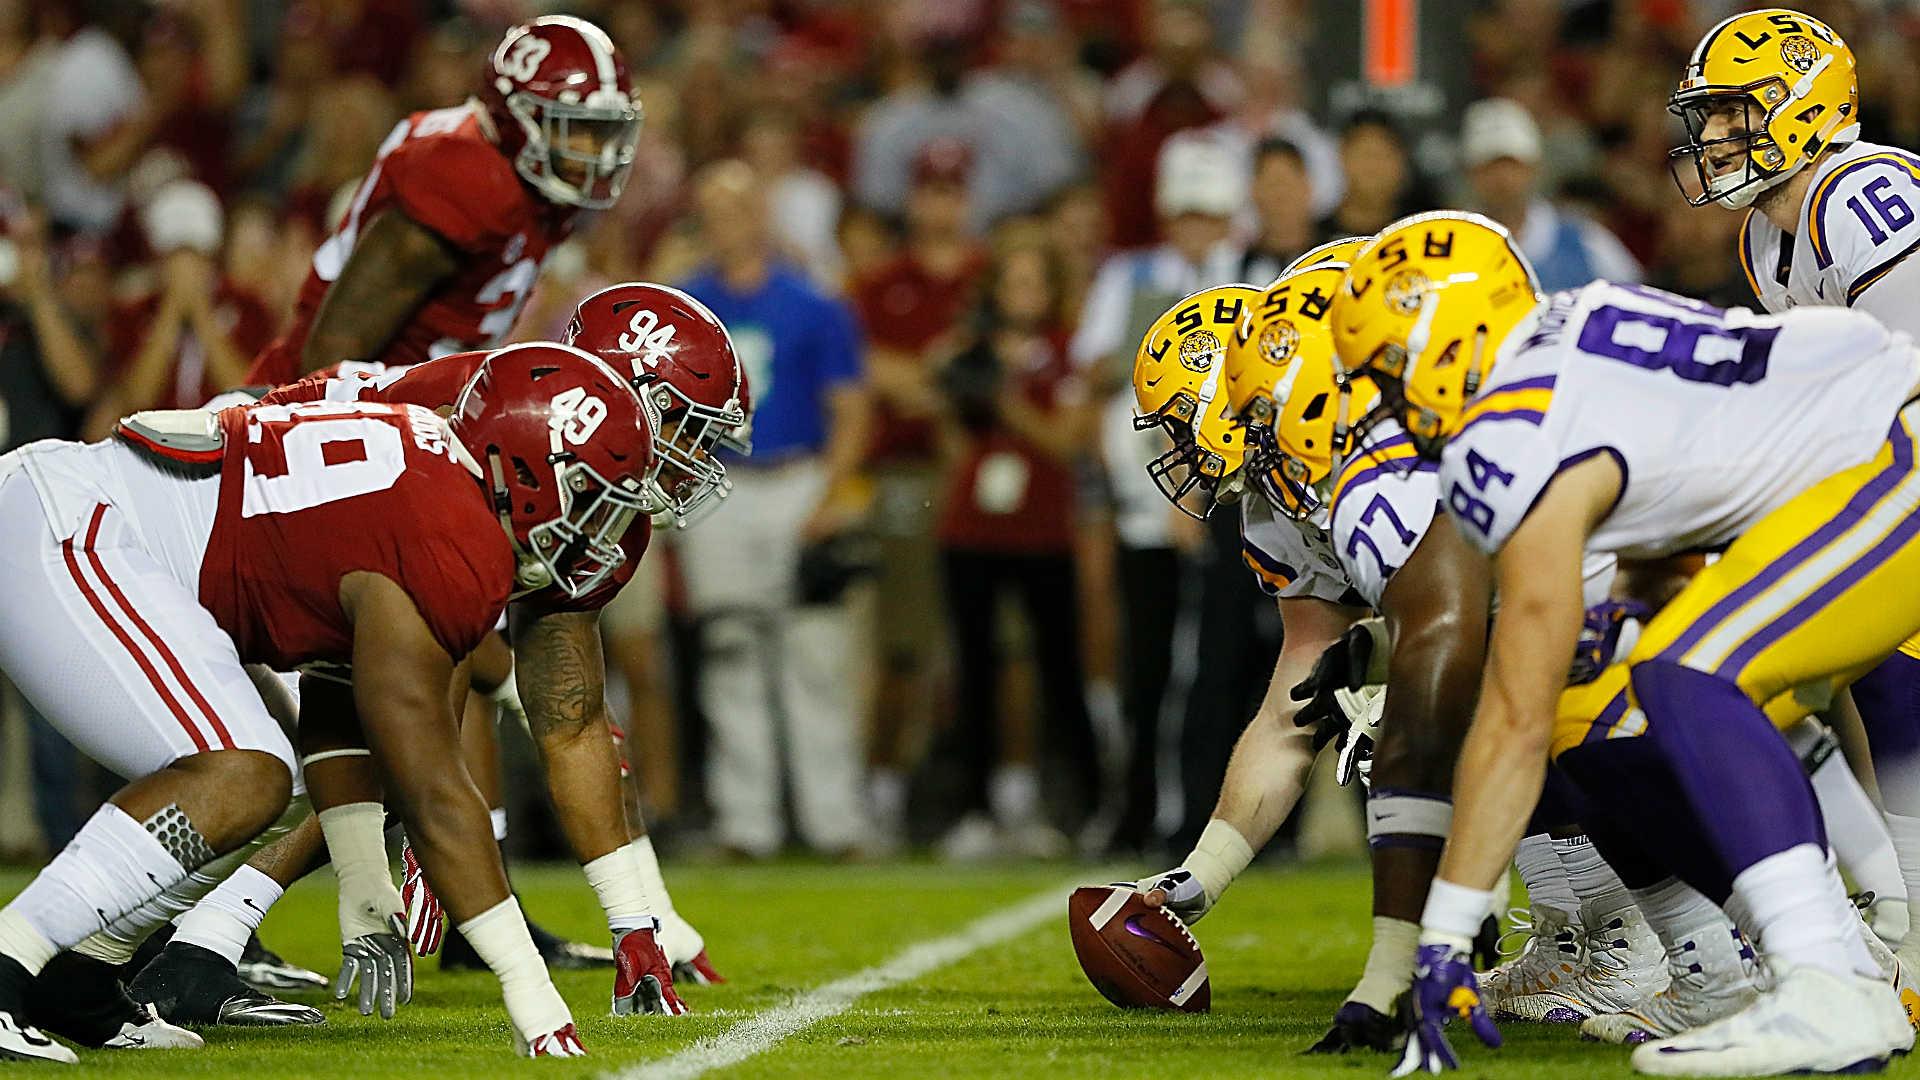 Why isn't Alabama vs. LSU played at night? CBS used its ...